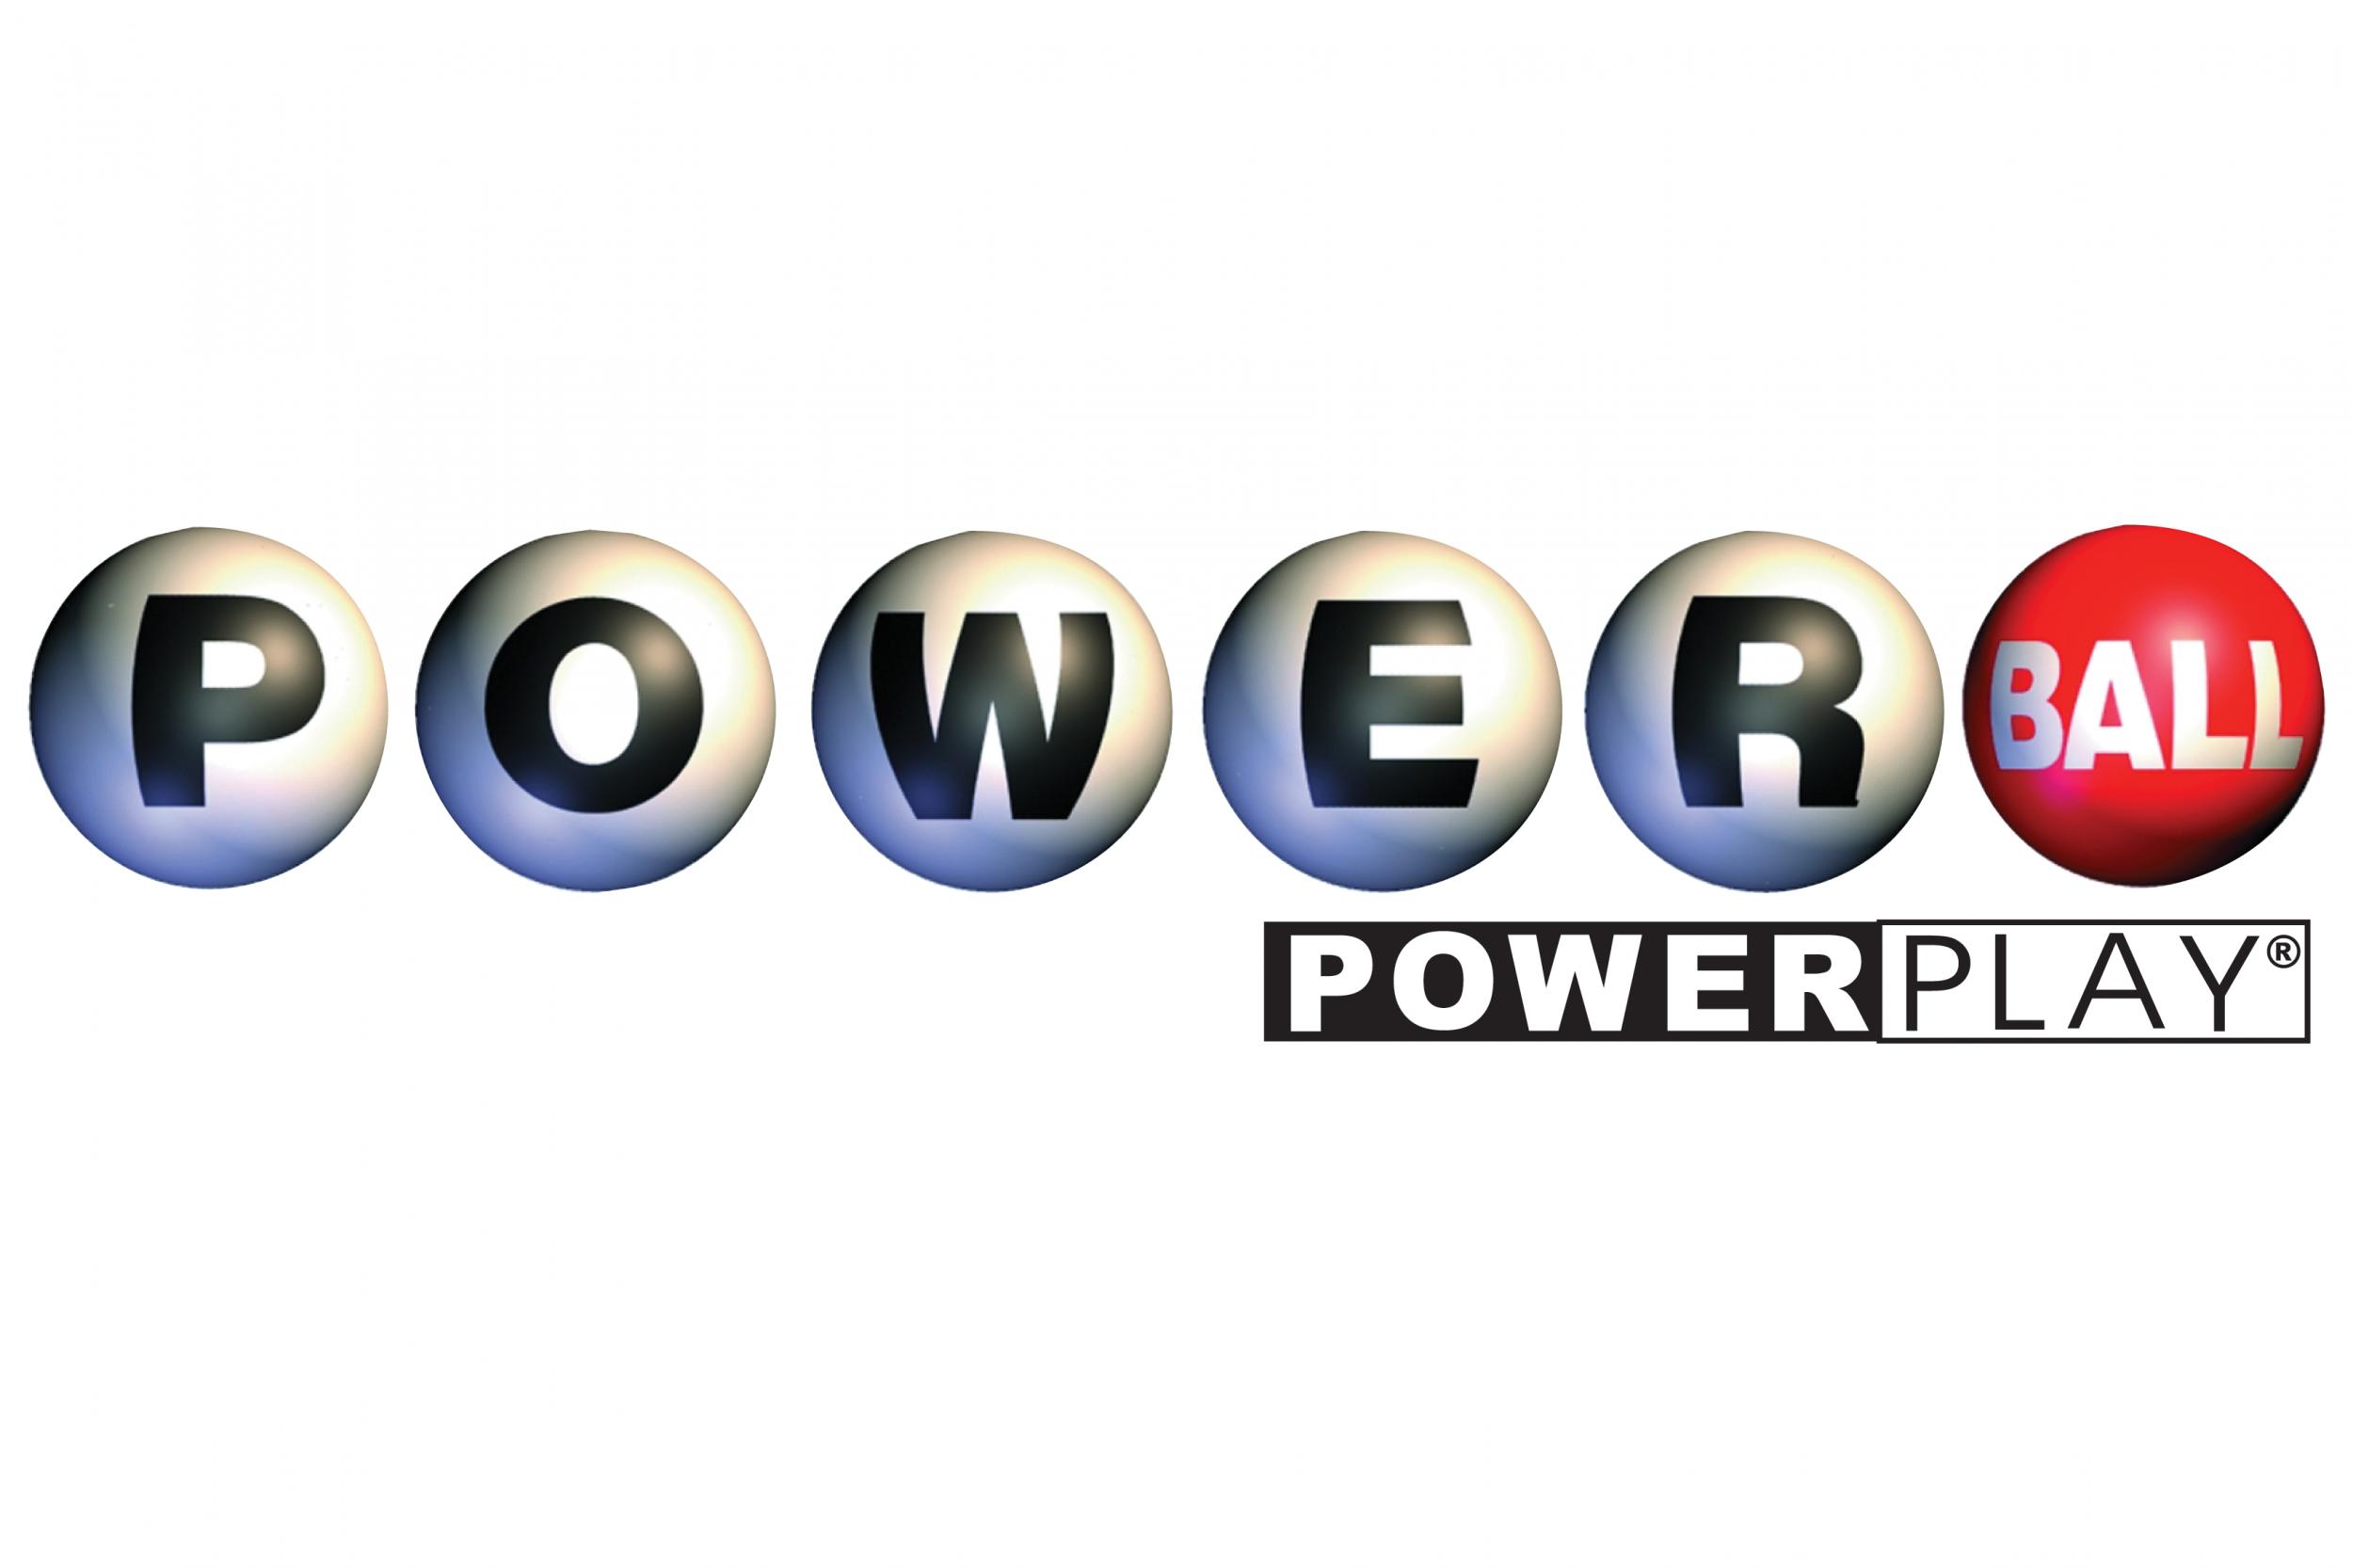 Как играть powerball американский лотерею? могу ли я играть powerball лото через интернет?   powerball лотереи